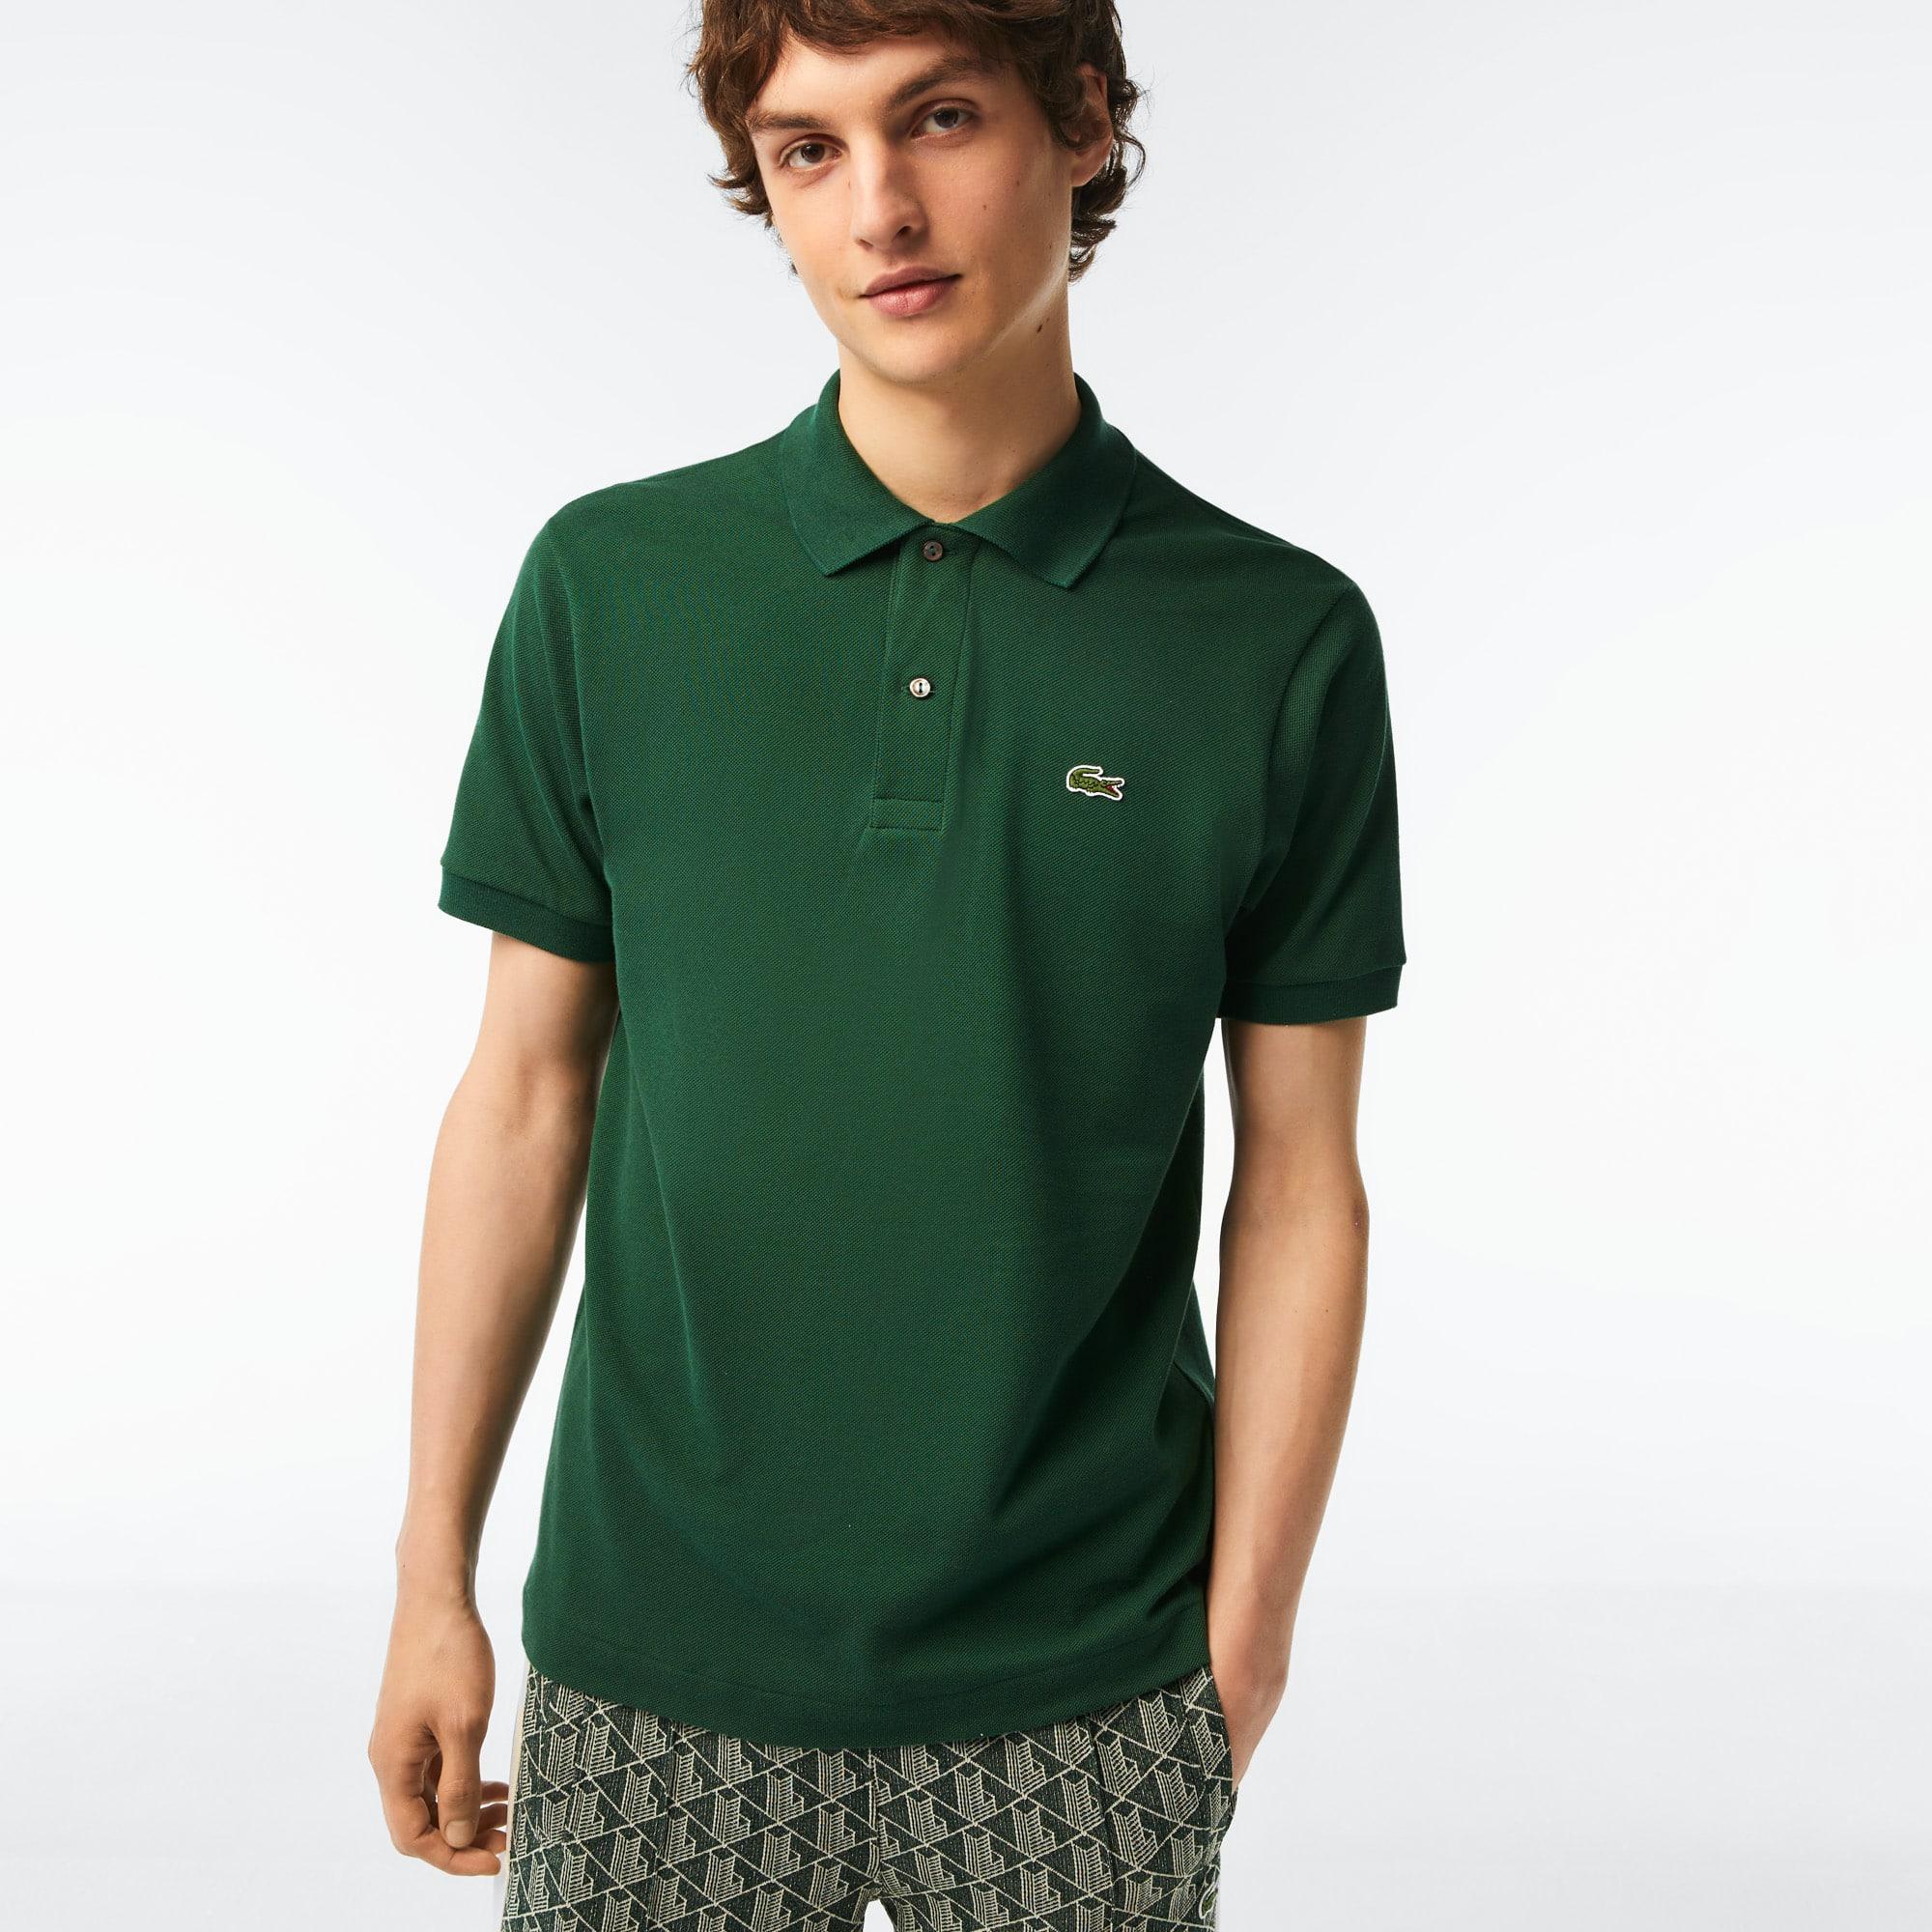 b57c18b8a0c16 Lacoste Classic Fit L.12.12 Polo Shirt